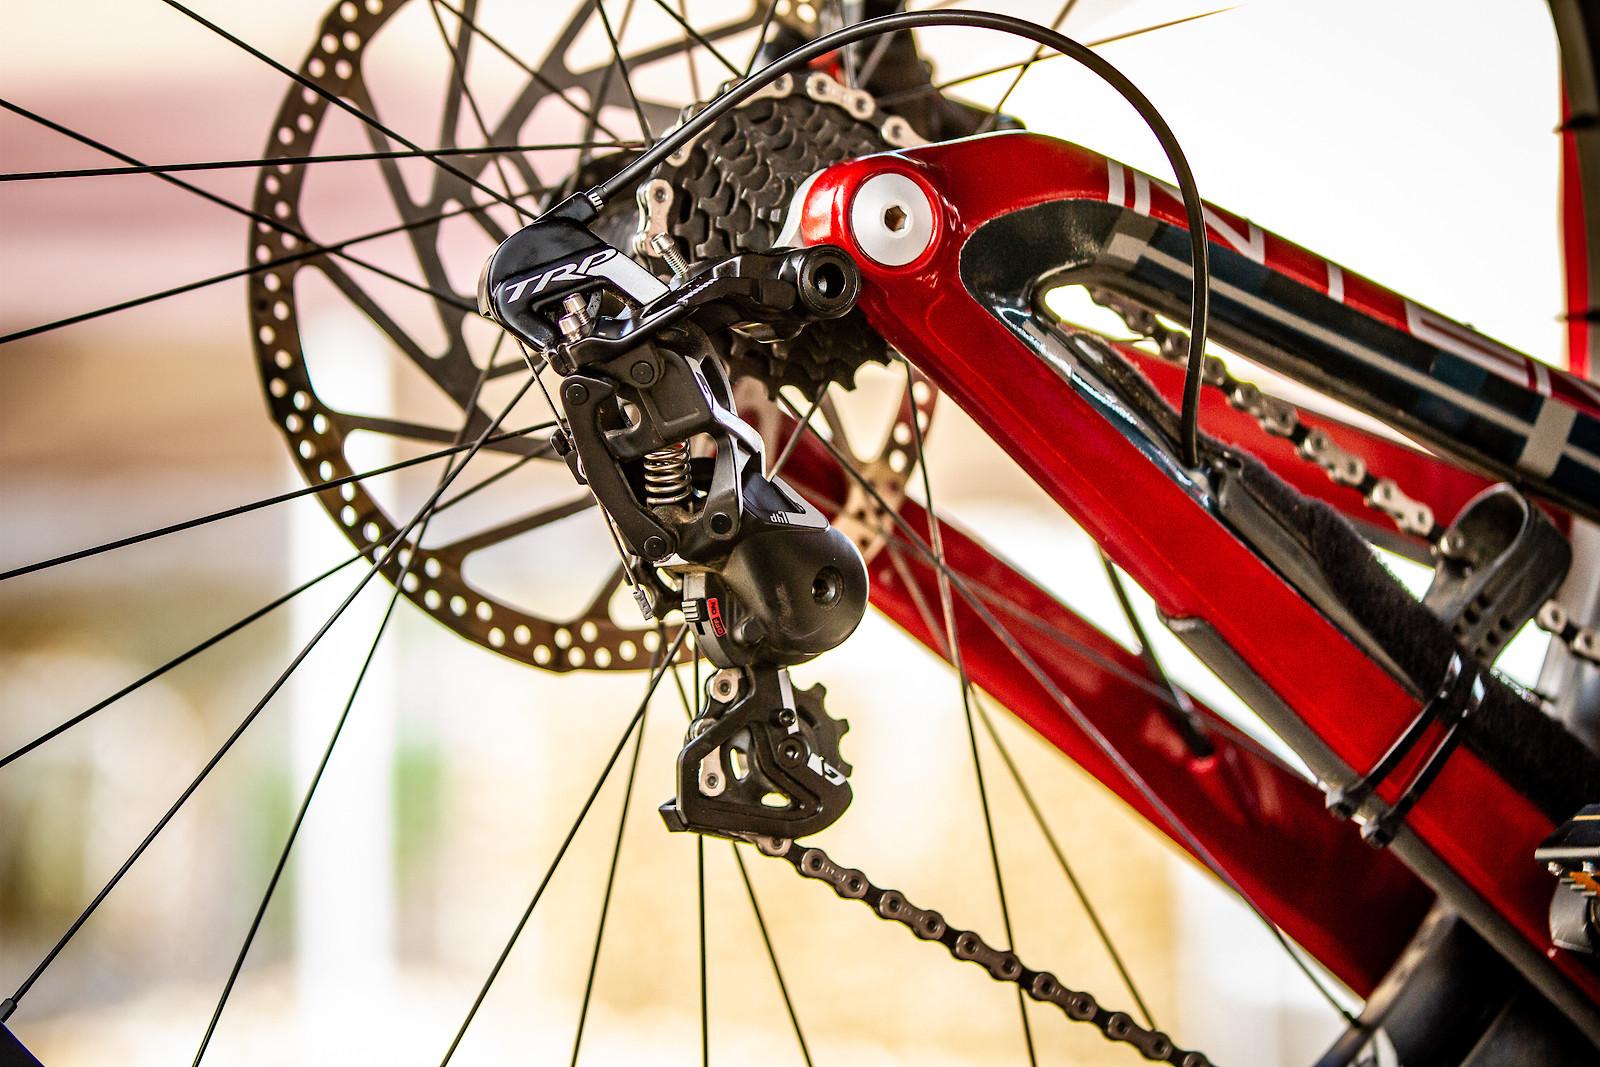 Neko Mulally - JackRice - Mountain Biking Pictures - Vital MTB